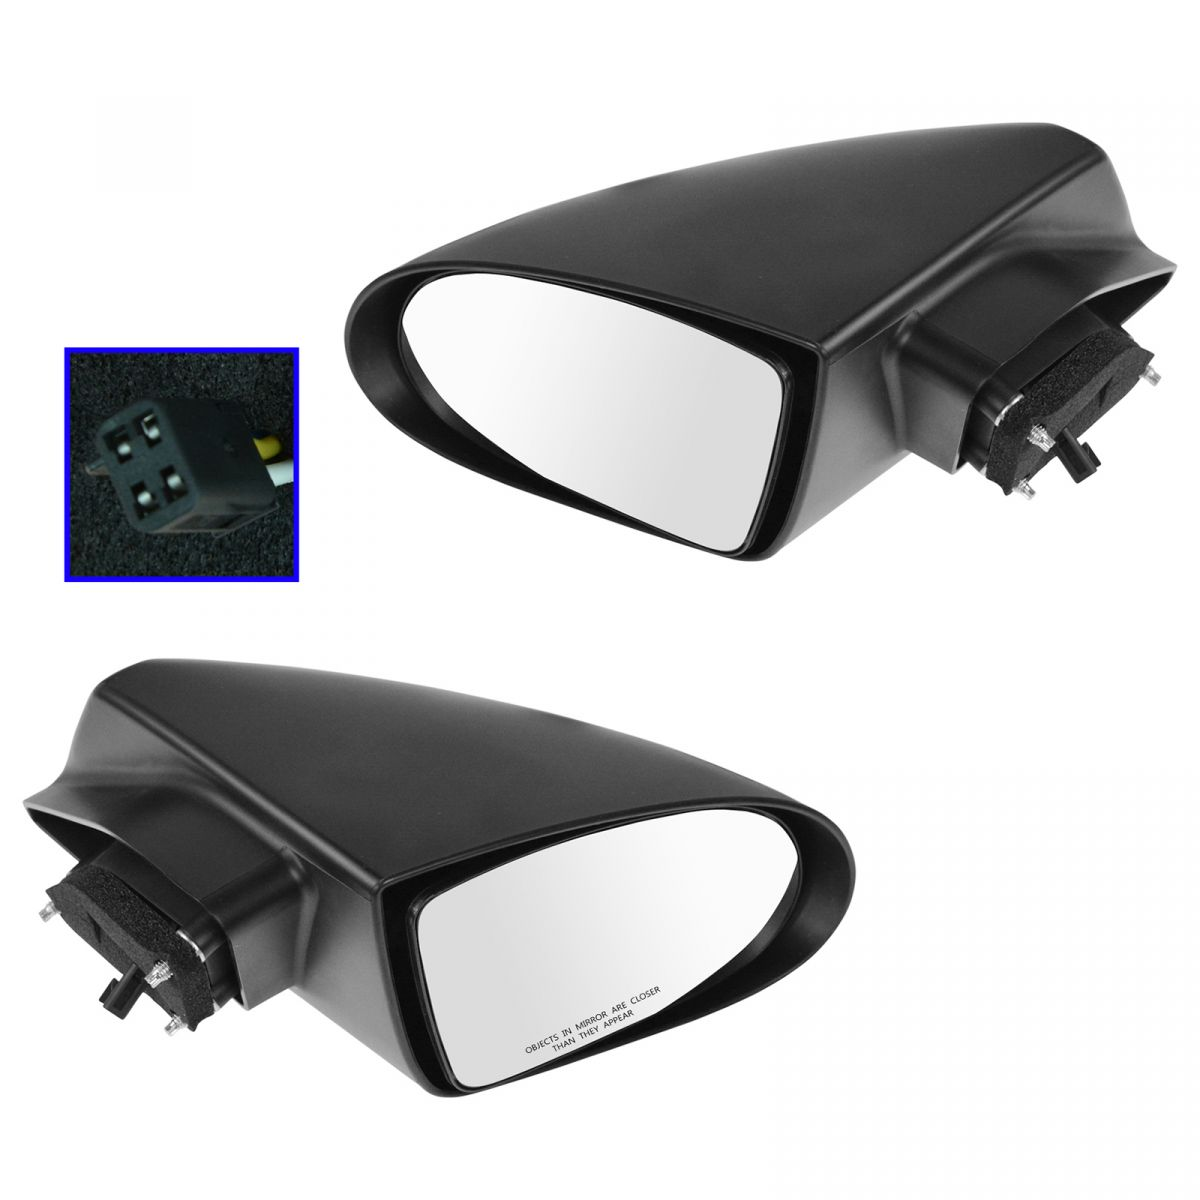 WAJ Lambda Oxygen Sensor OZA668-EE12 Fits Honda Civic VII Stufenheck Prelude V